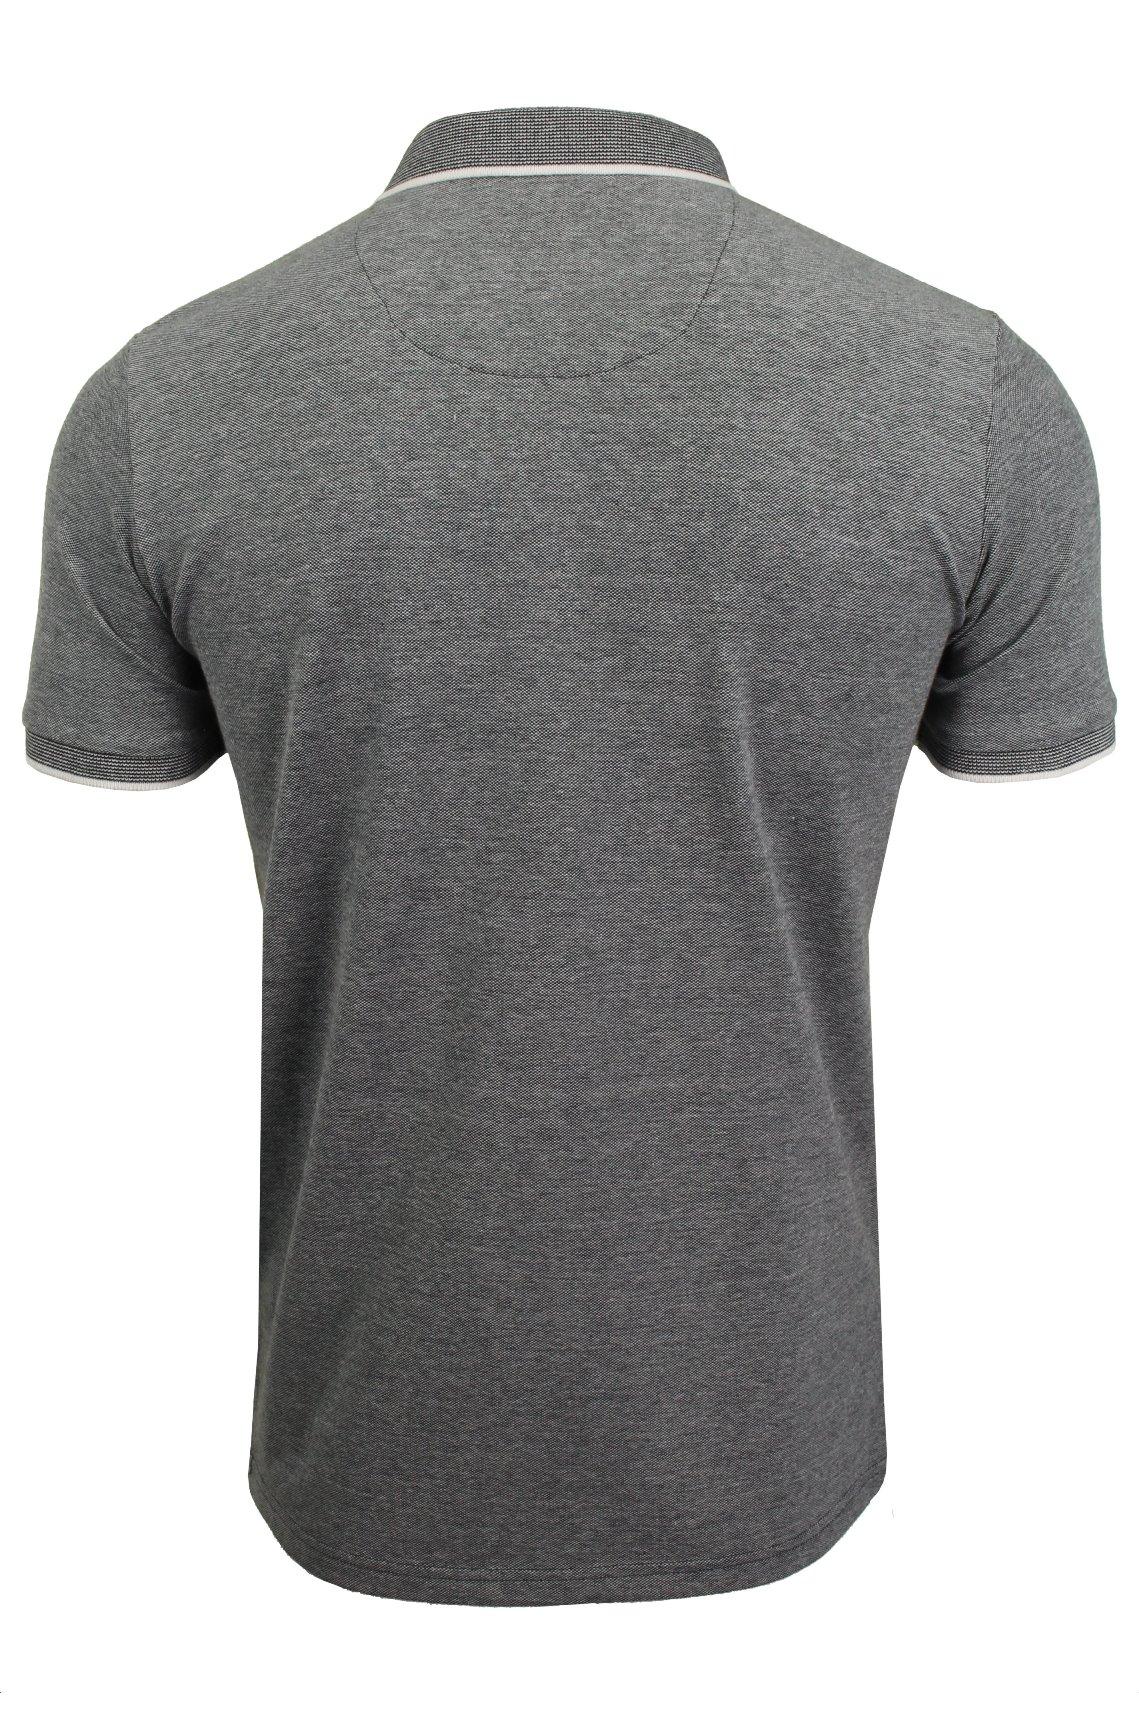 Brave-Soul-Mens-Polo-T-Shirt-Birdseye-Pique-Short-Sleeved thumbnail 8